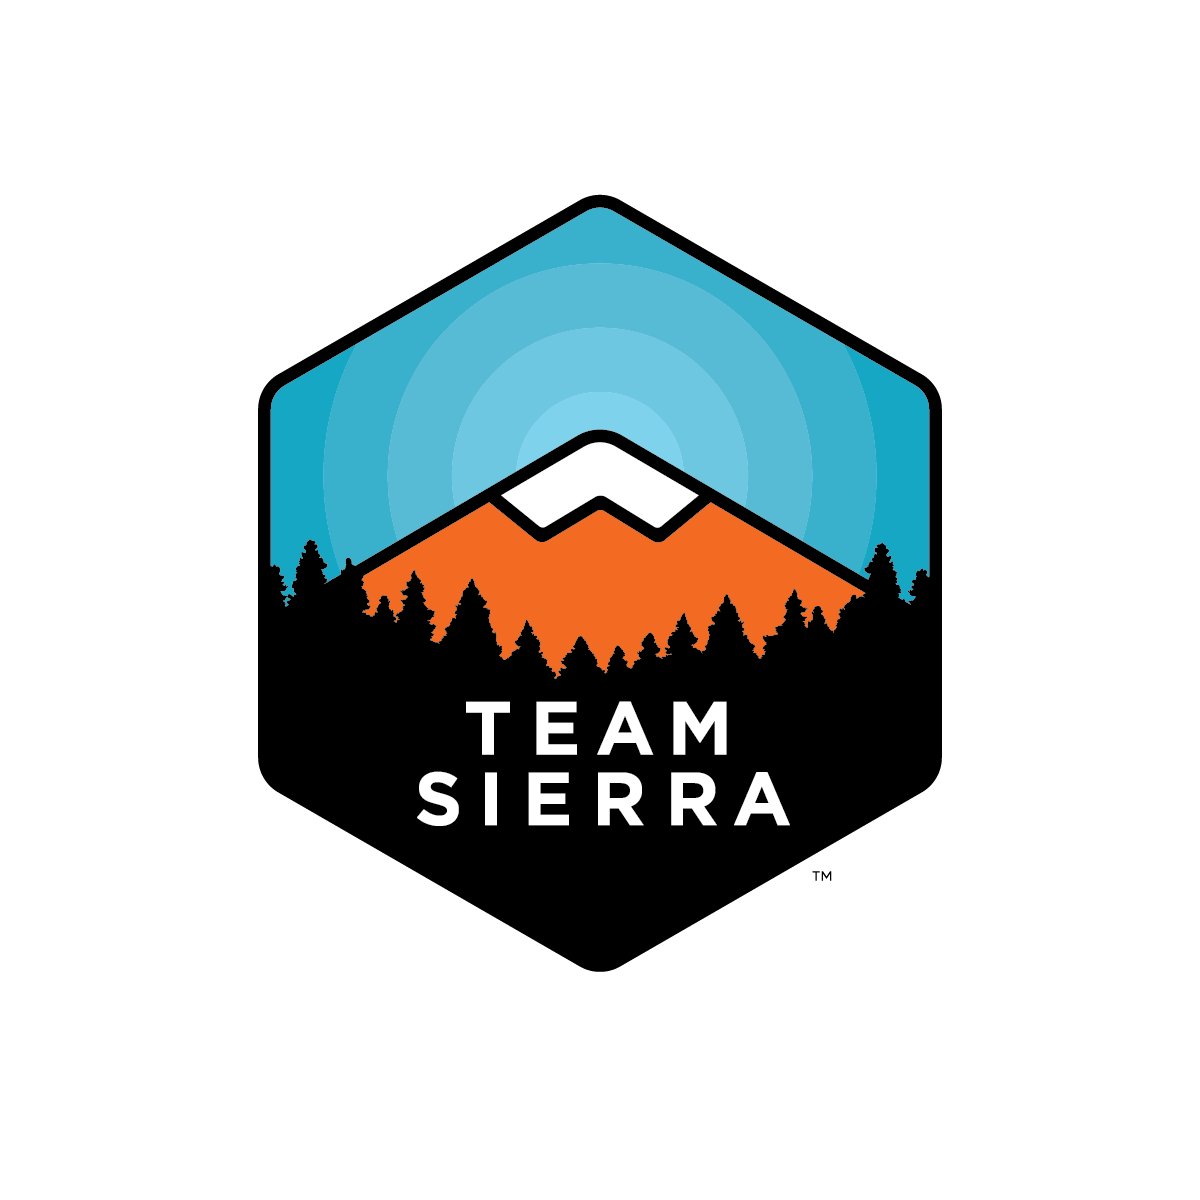 Sierra club logo clipart svg free stock Style Guide - Team Sierra svg free stock